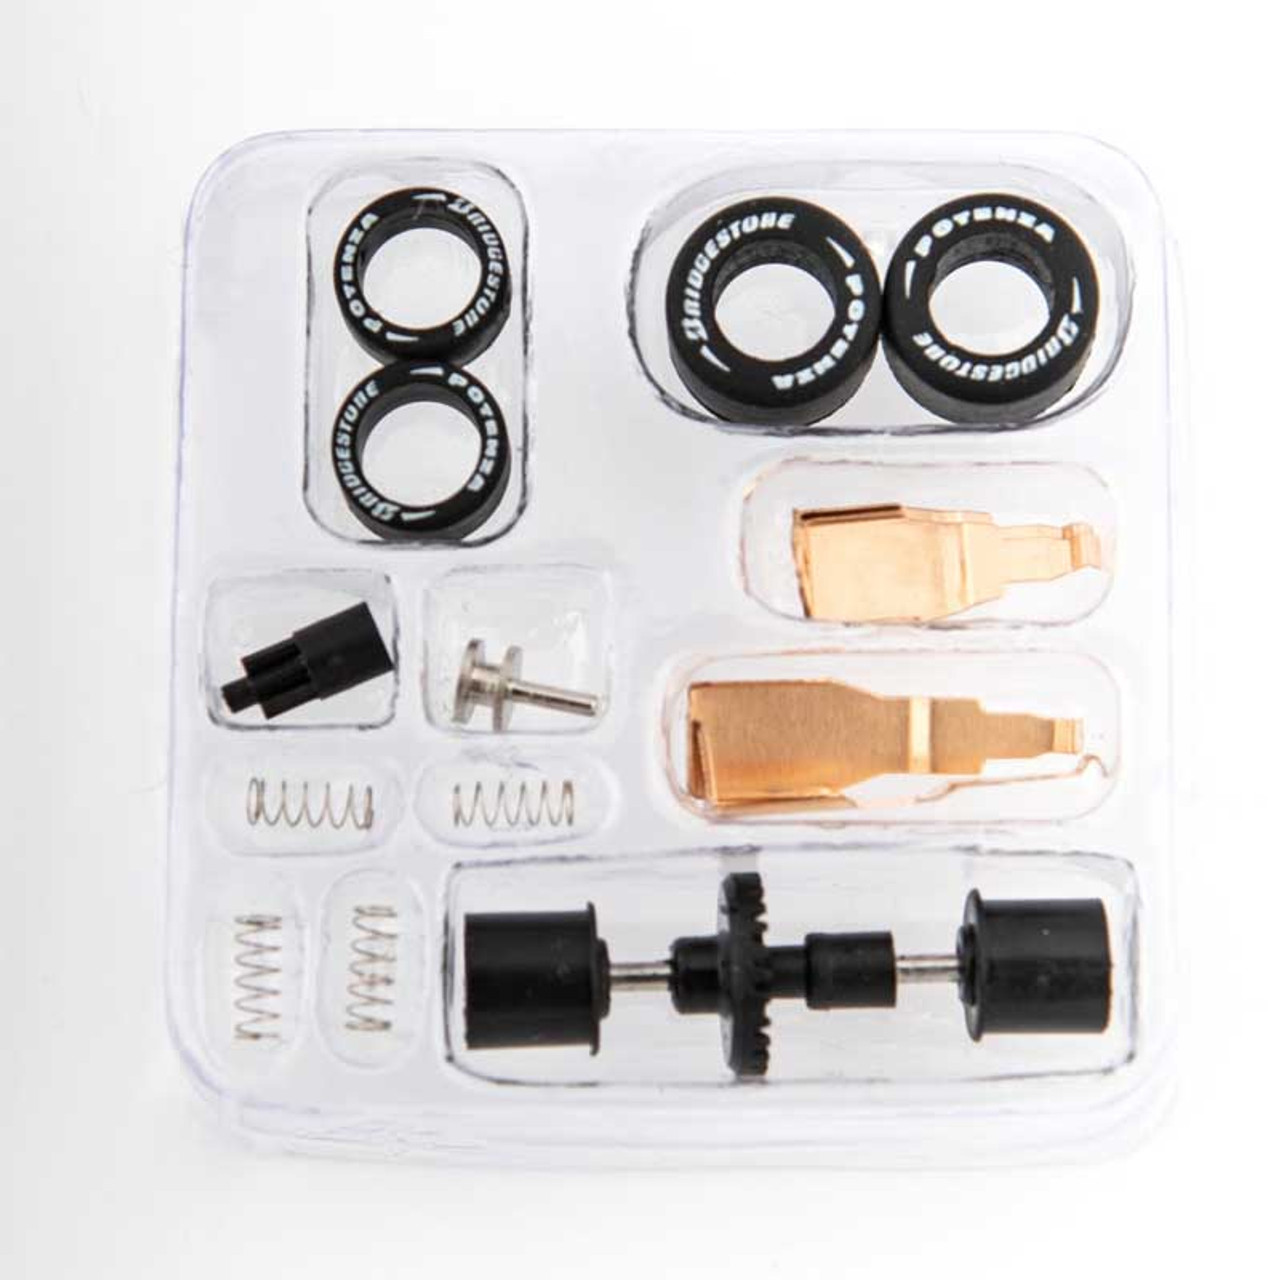 AFX Mega G Long pickup Tune-up Kit w// rear gear assy